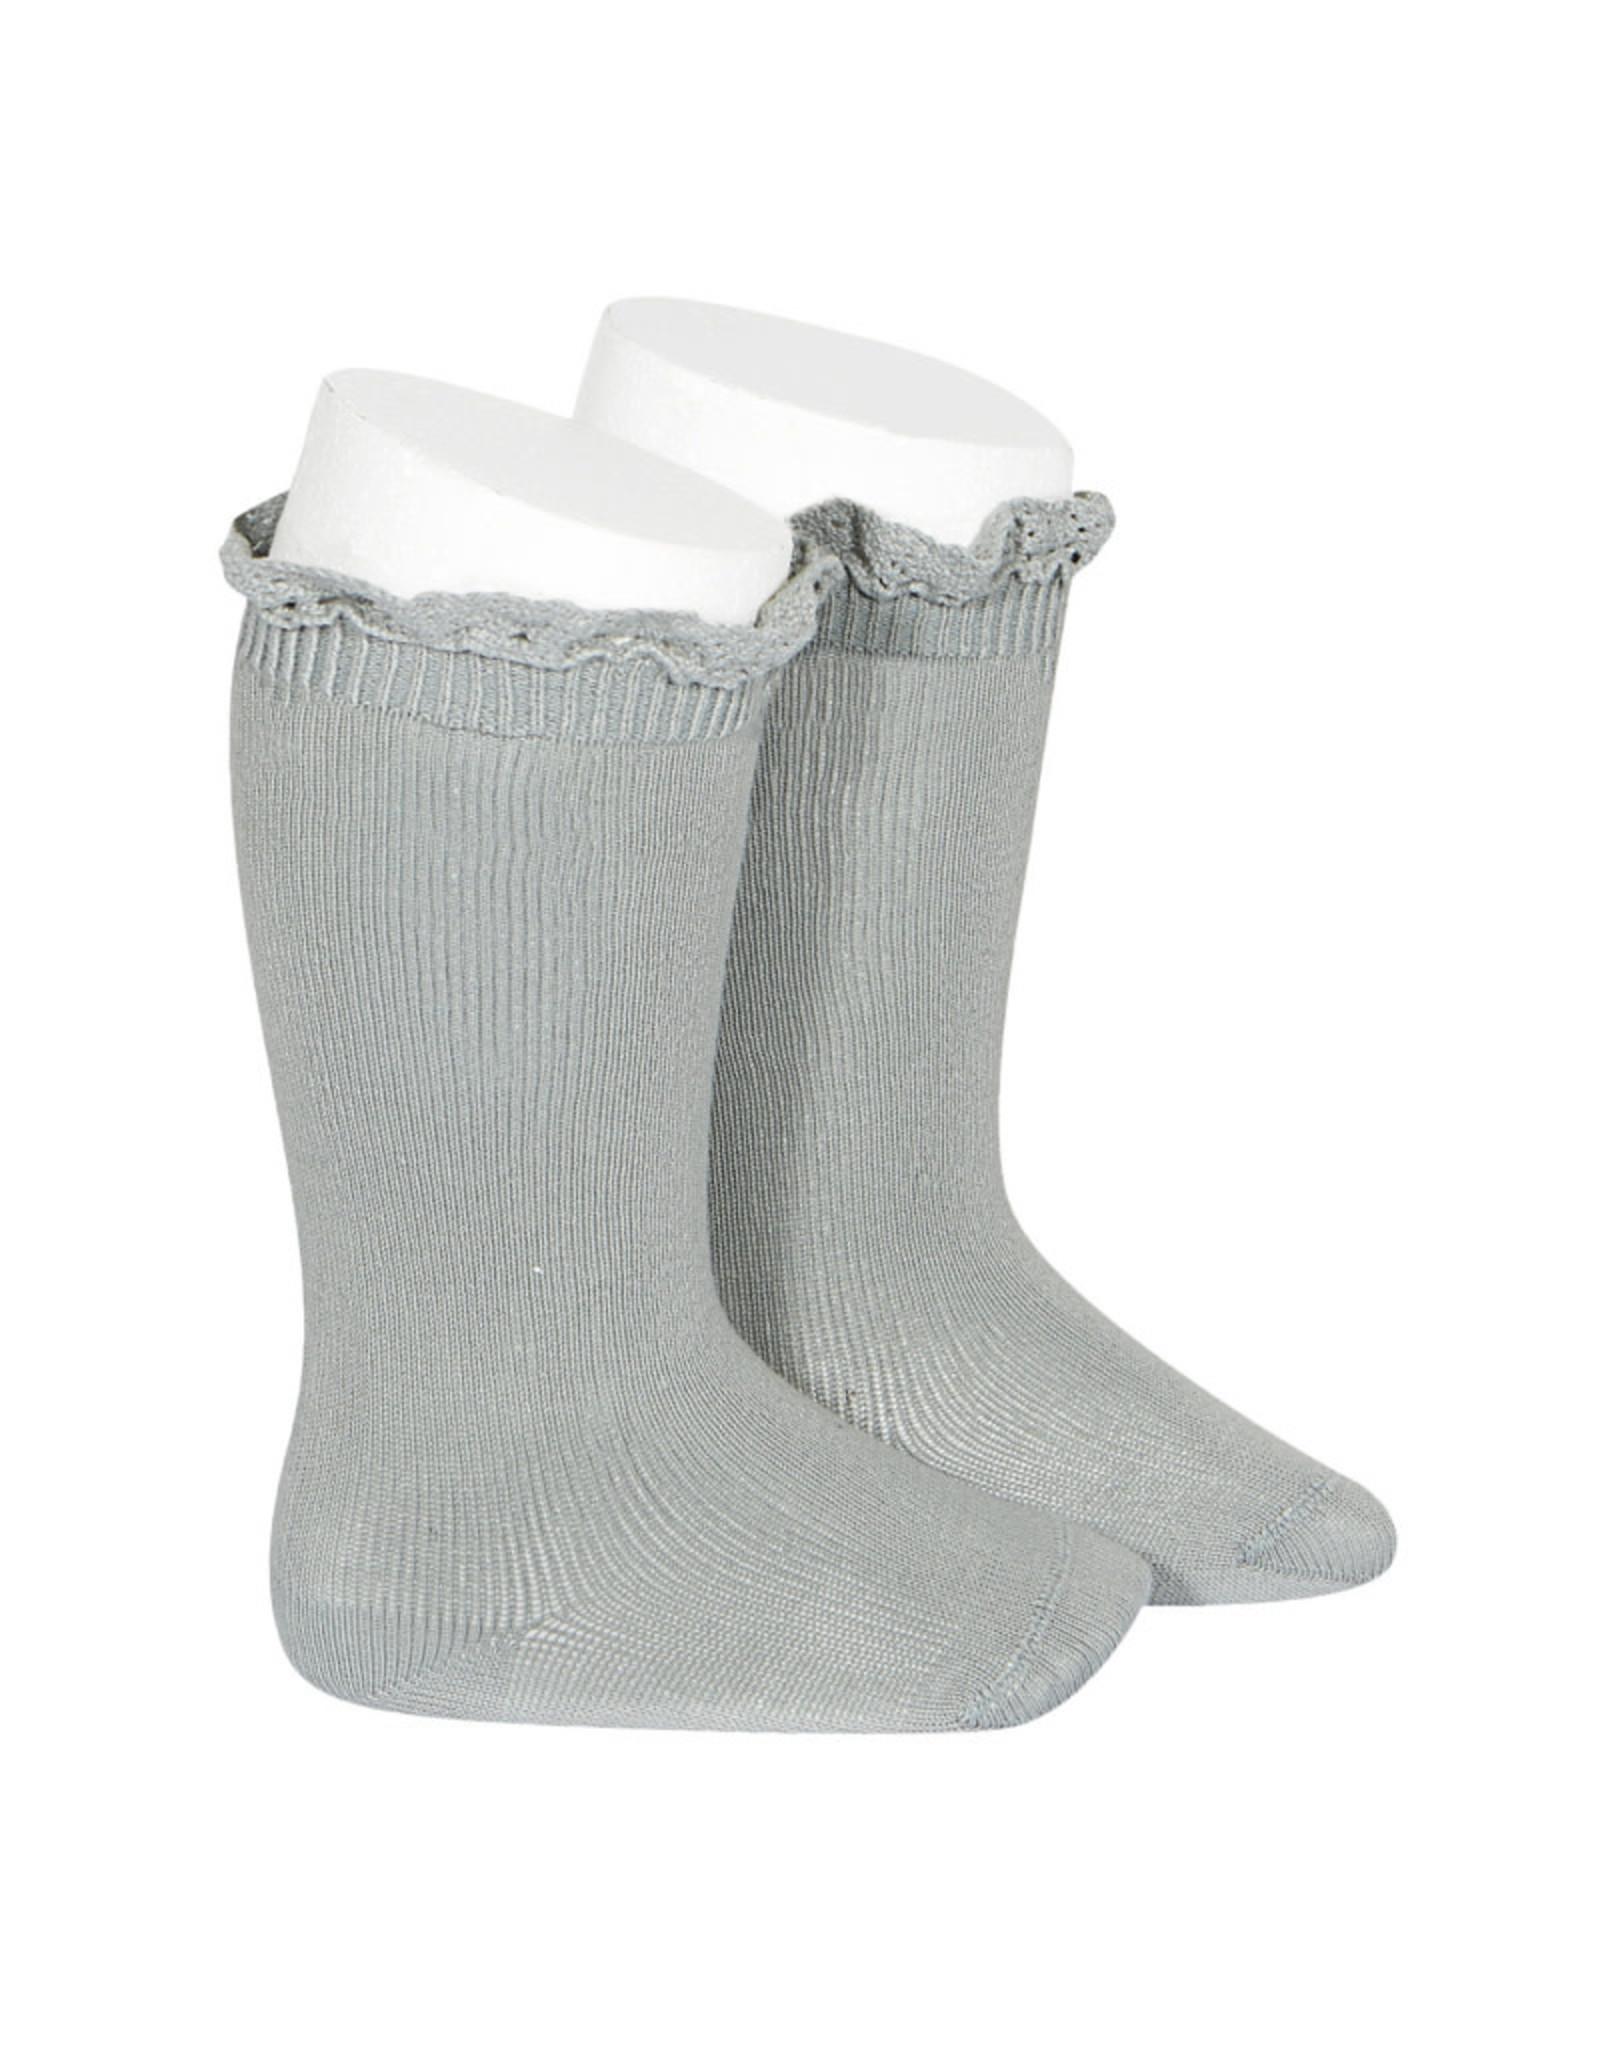 CONDOR Dry Green Lace Edging Knee Socks